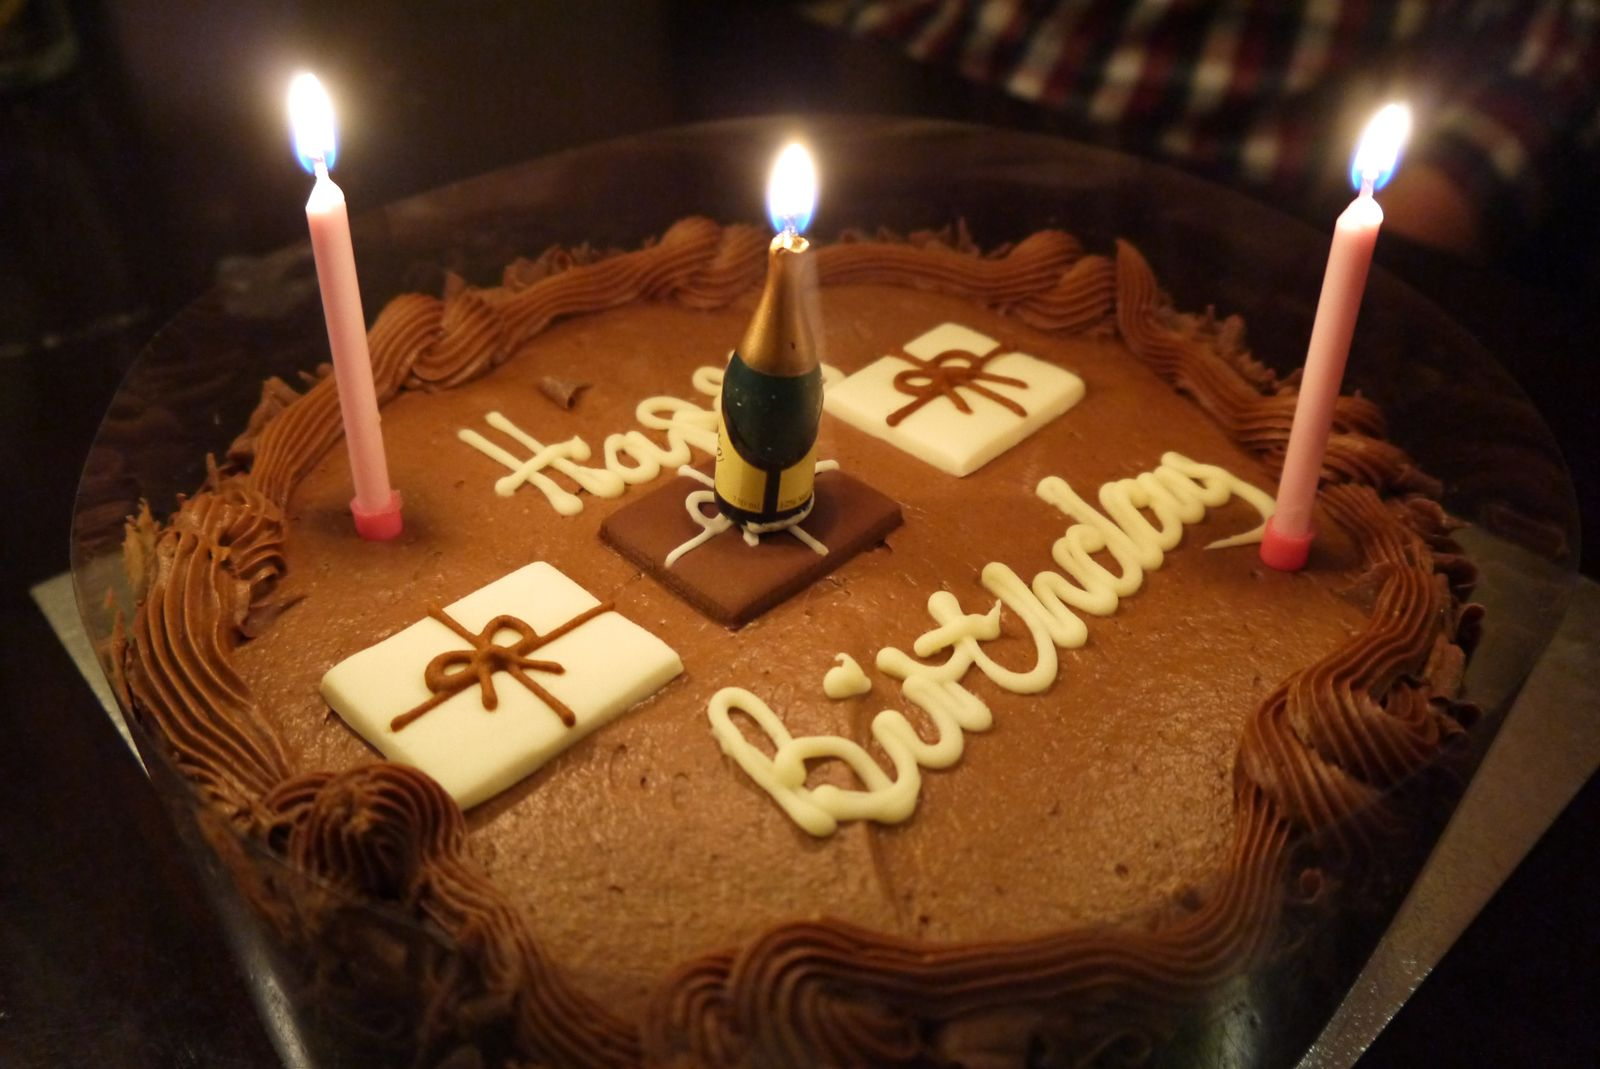 Pic Of Birthday Cake With Name Birthday Wishes Cake Pinterest